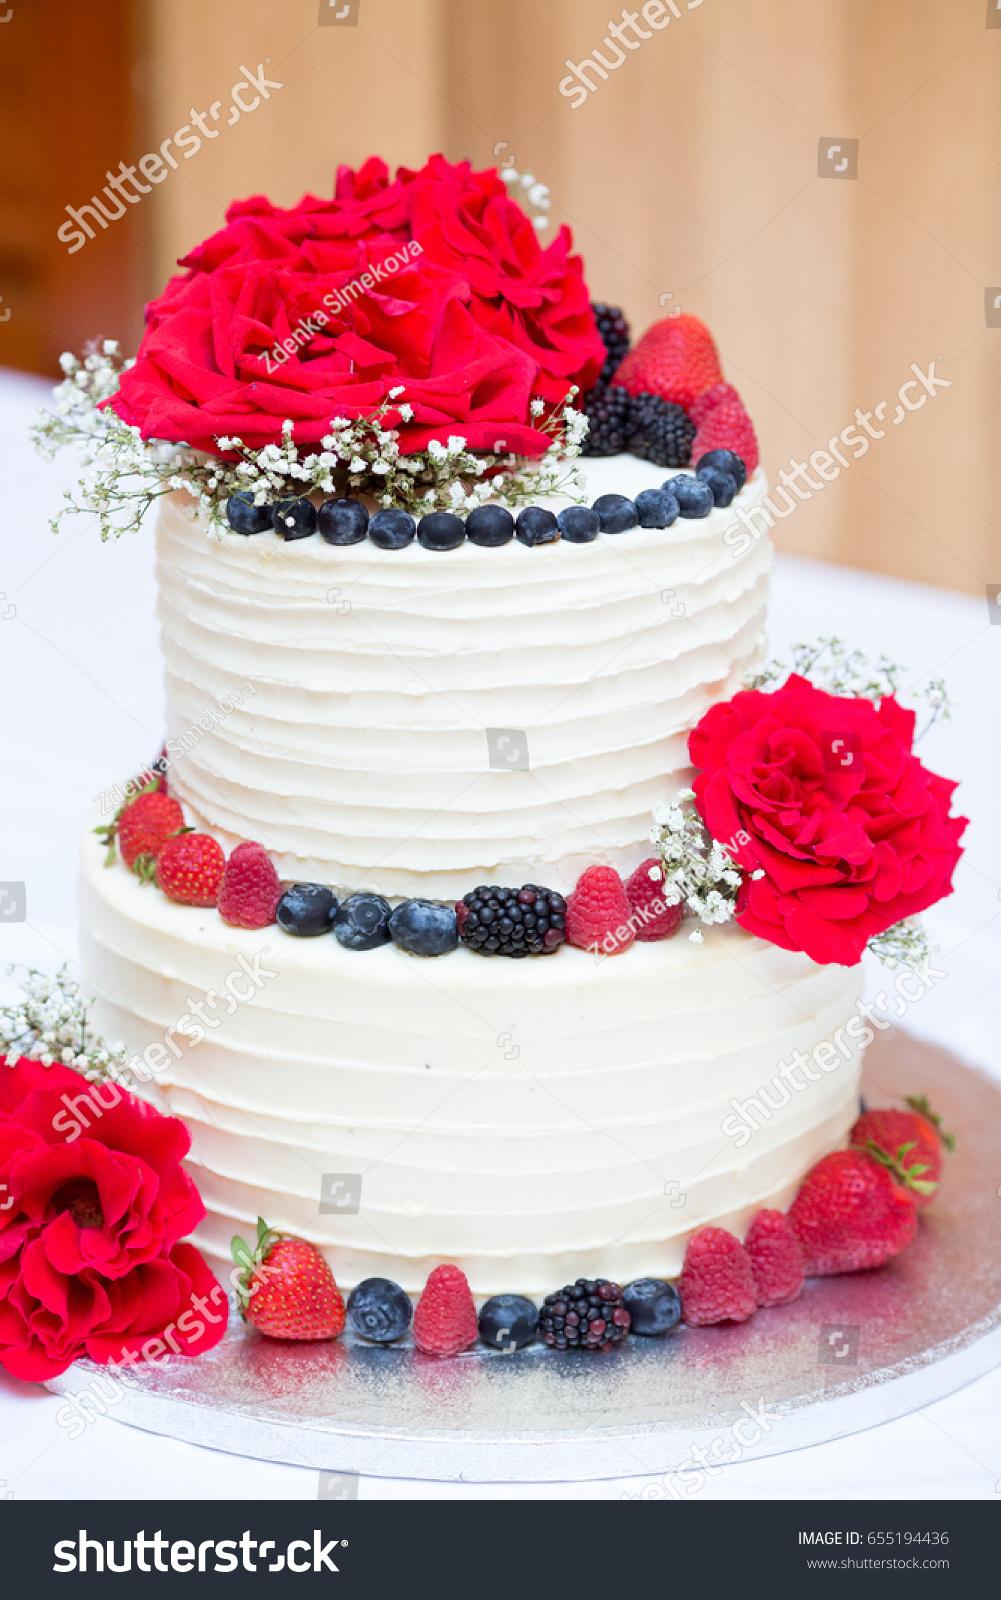 Two Layers Birthday Cream Berries Cake Stock Photo (Royalty Free ...